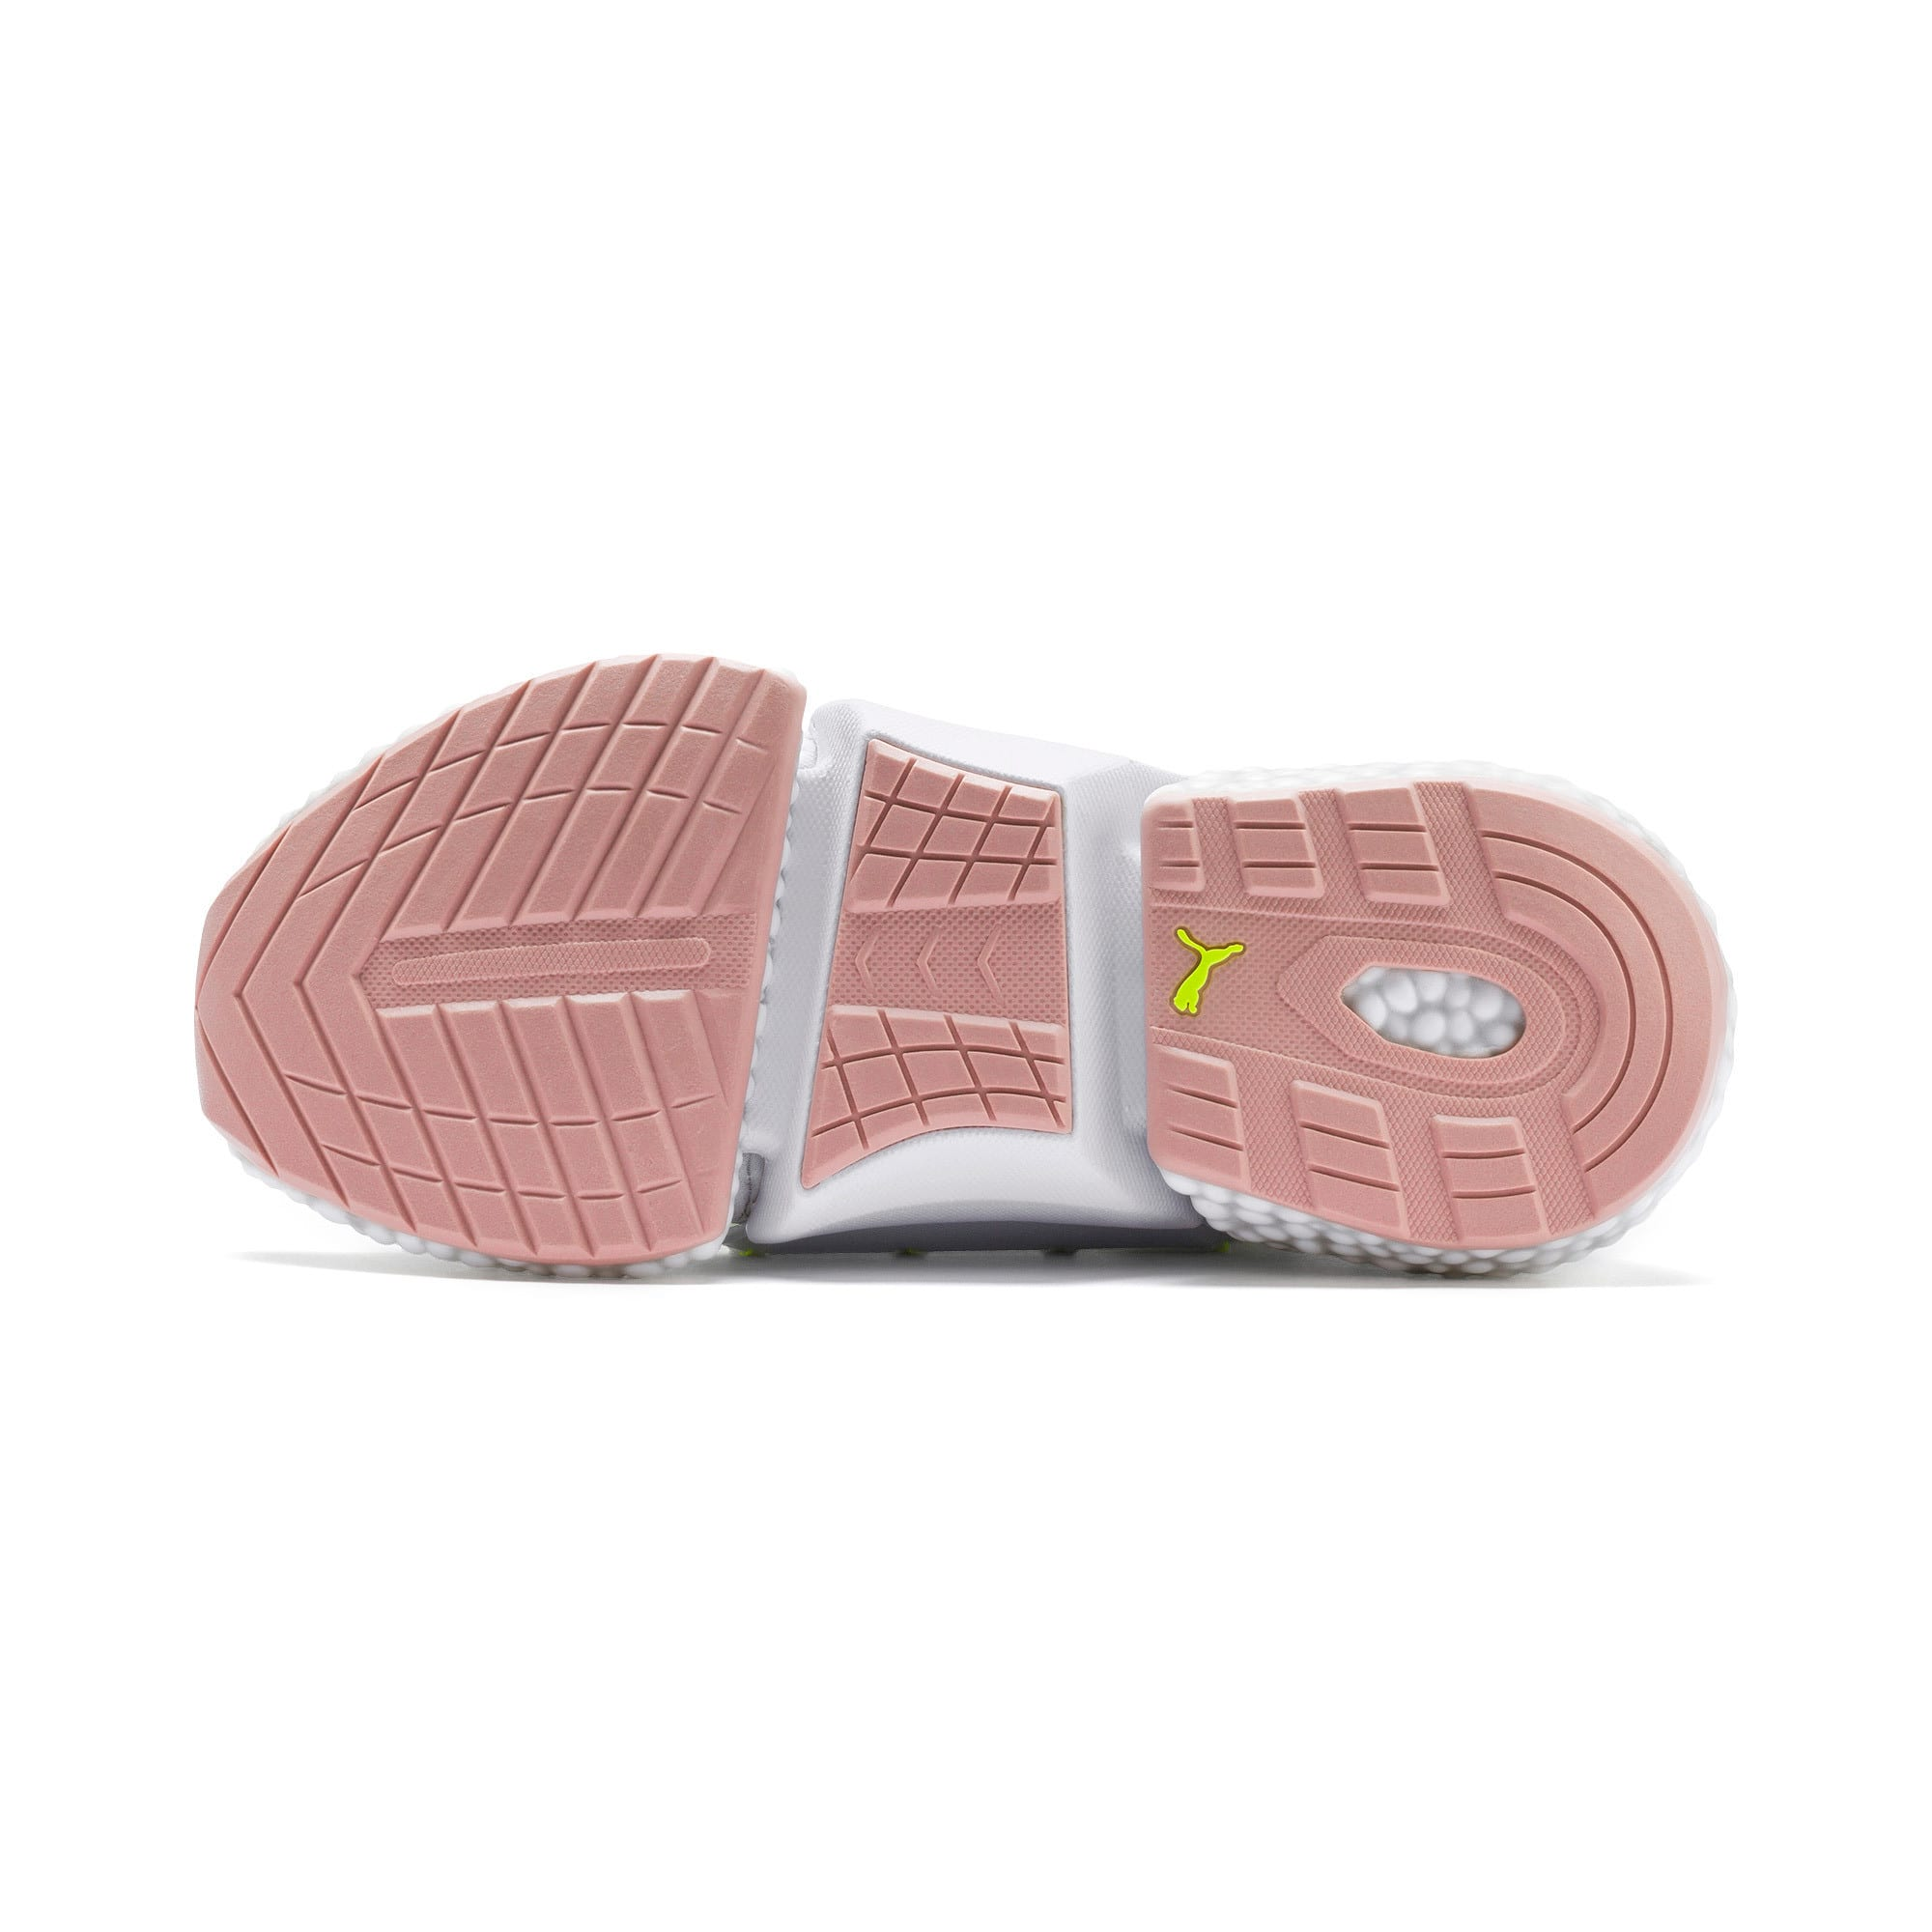 Thumbnail 4 of HYBRID Rocket Aero Women's Running Shoes, Puma White-Bridal Rose, medium